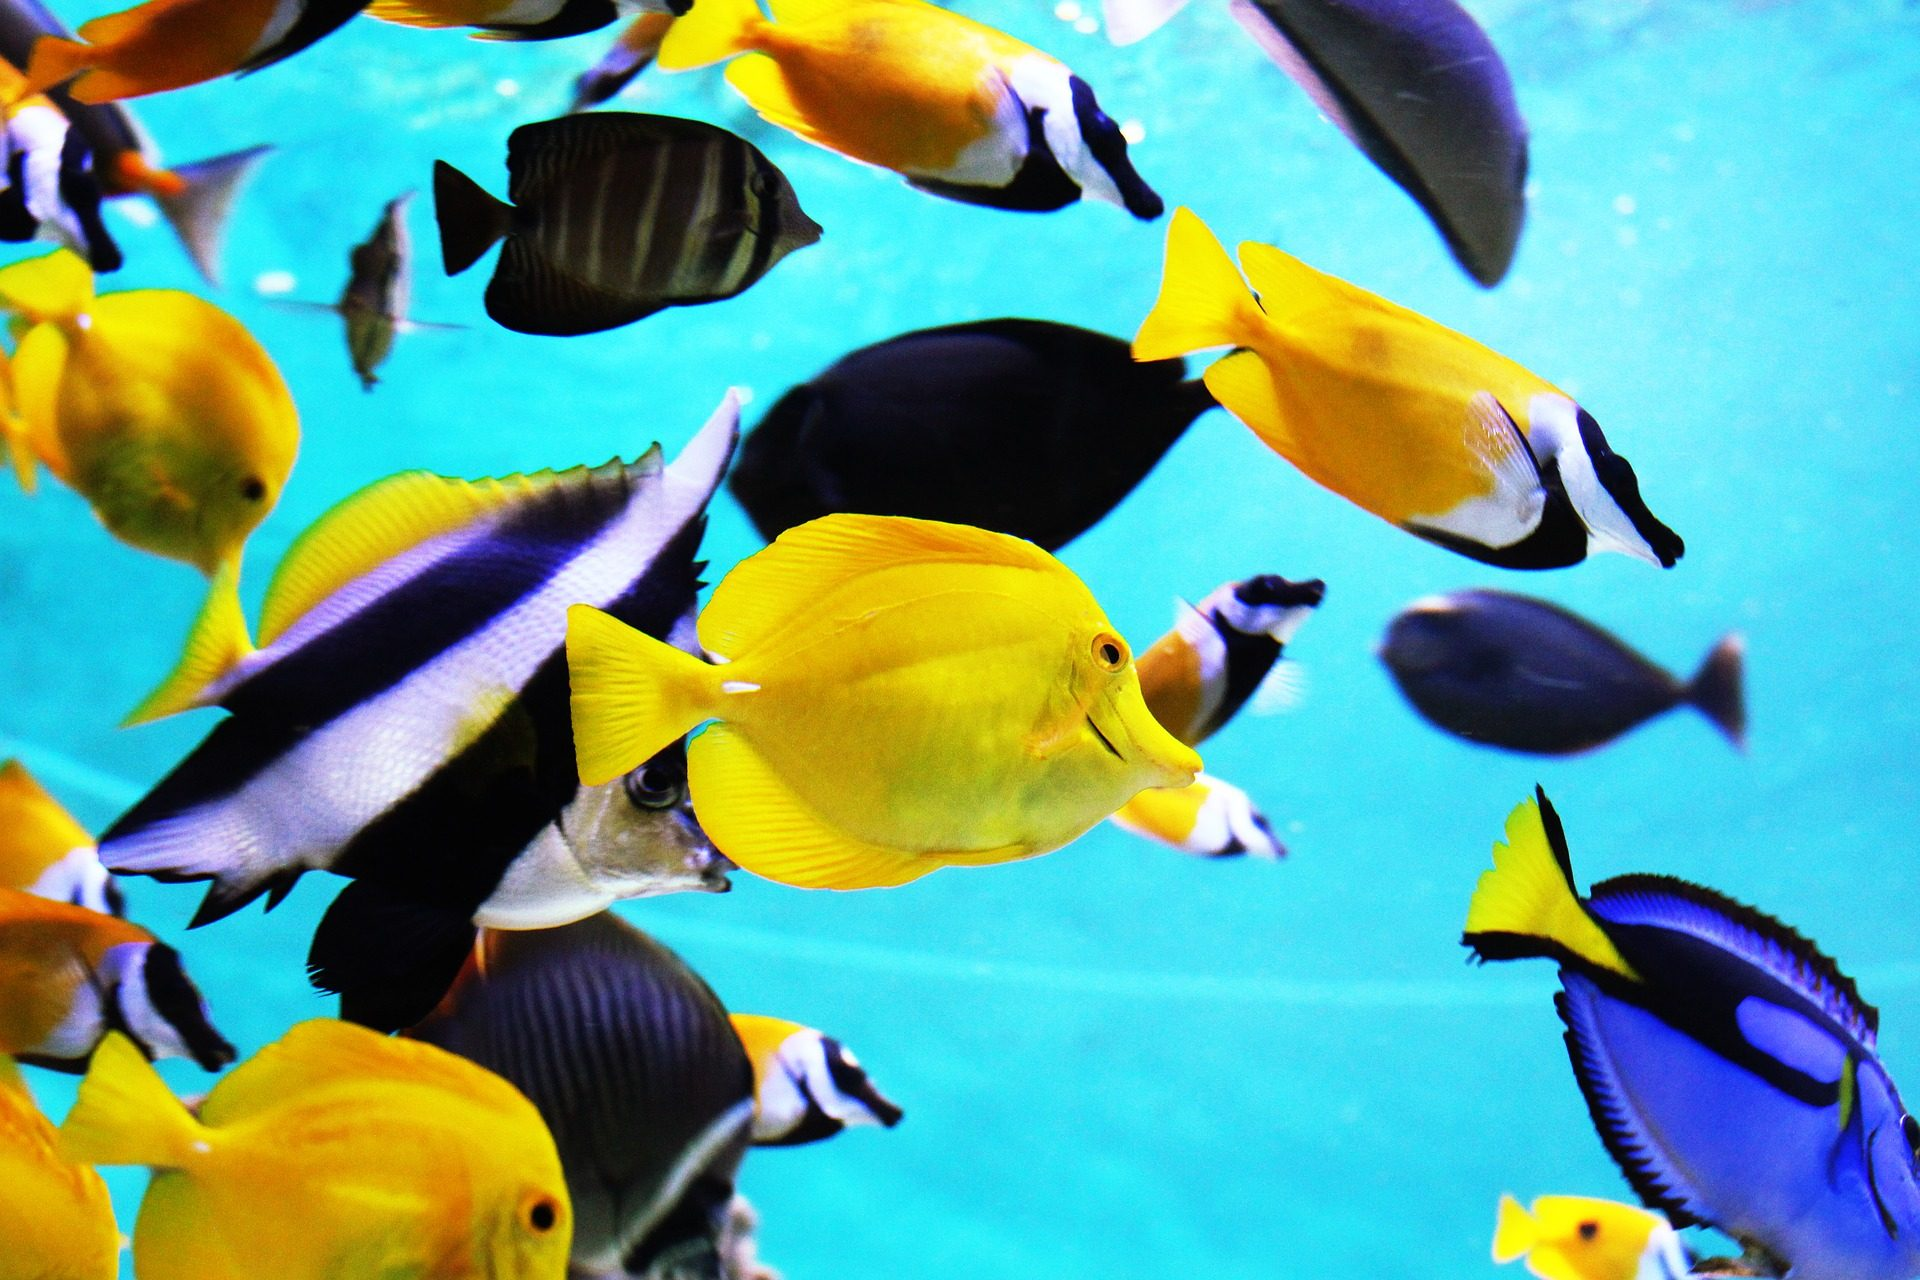 Fisch, tropische, bunte, Aquarium, exotische - Wallpaper HD - Prof.-falken.com